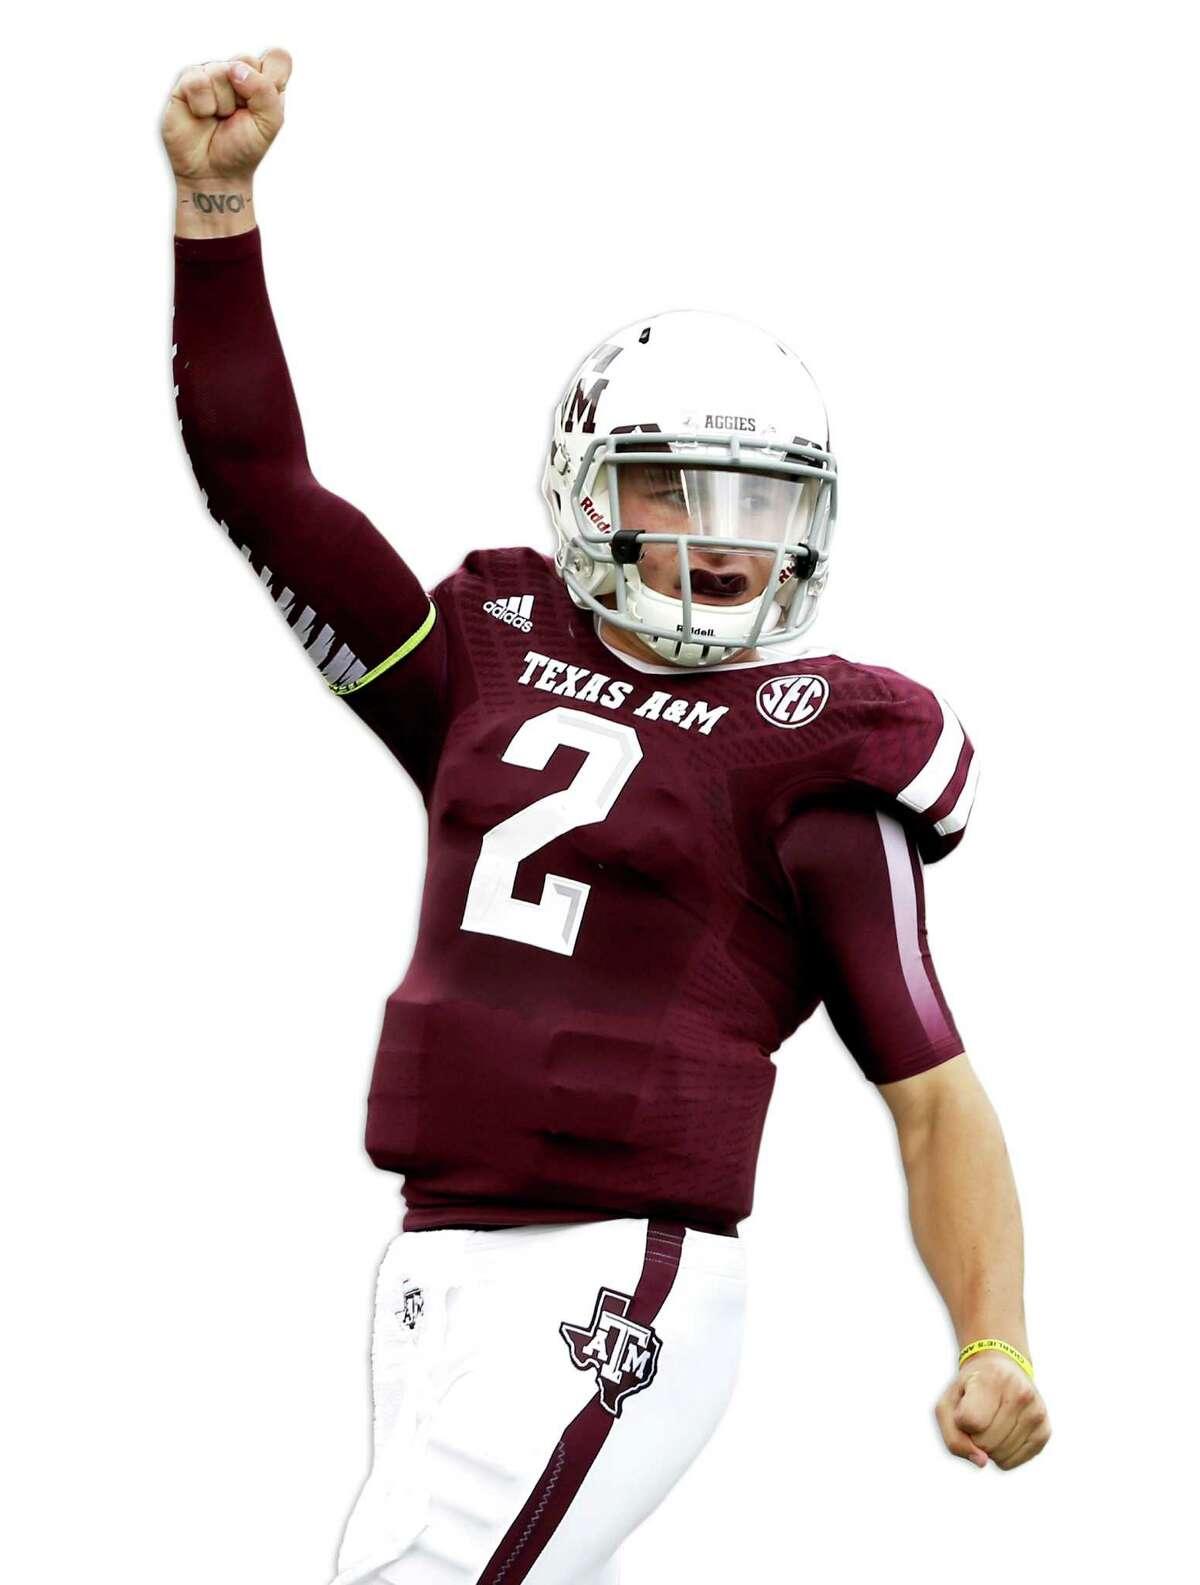 In his first mock draft this year, veteran ESPN draft analyst Mel Kiper Jr. has A&M quarterback Johnny Manziel going first to the Texans.